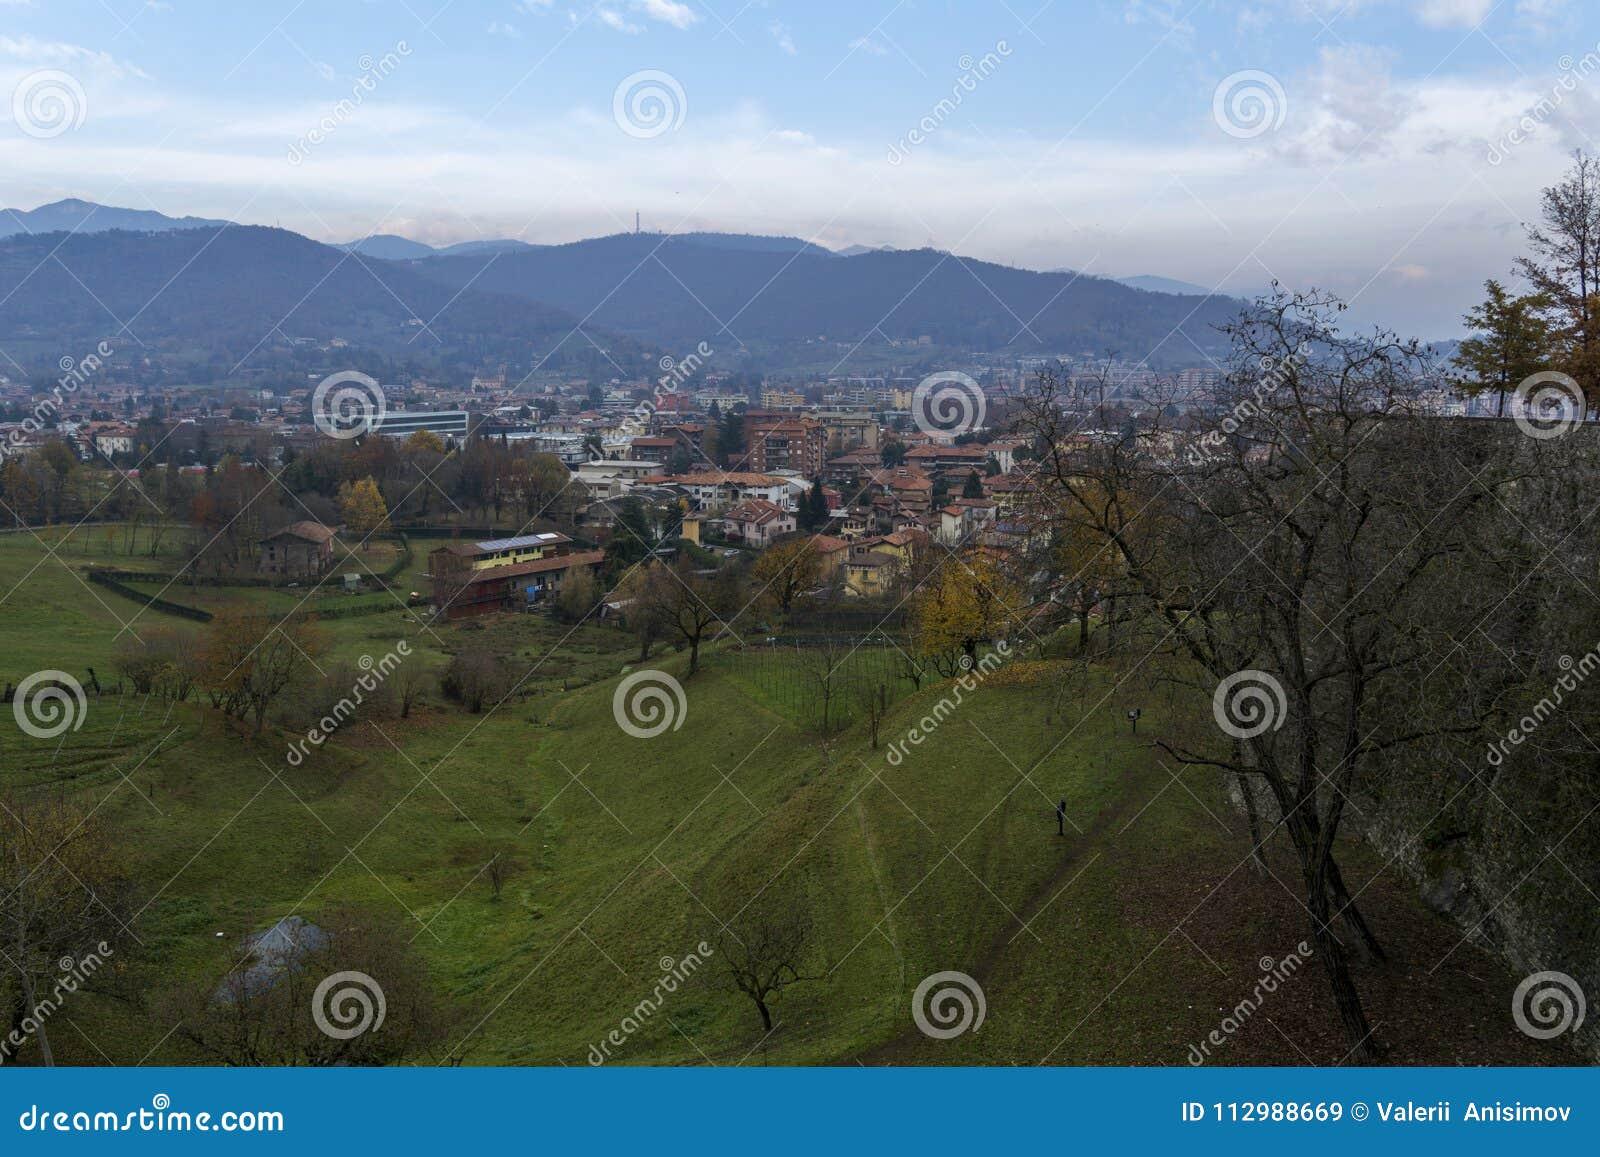 The views of Bergamo. Italy